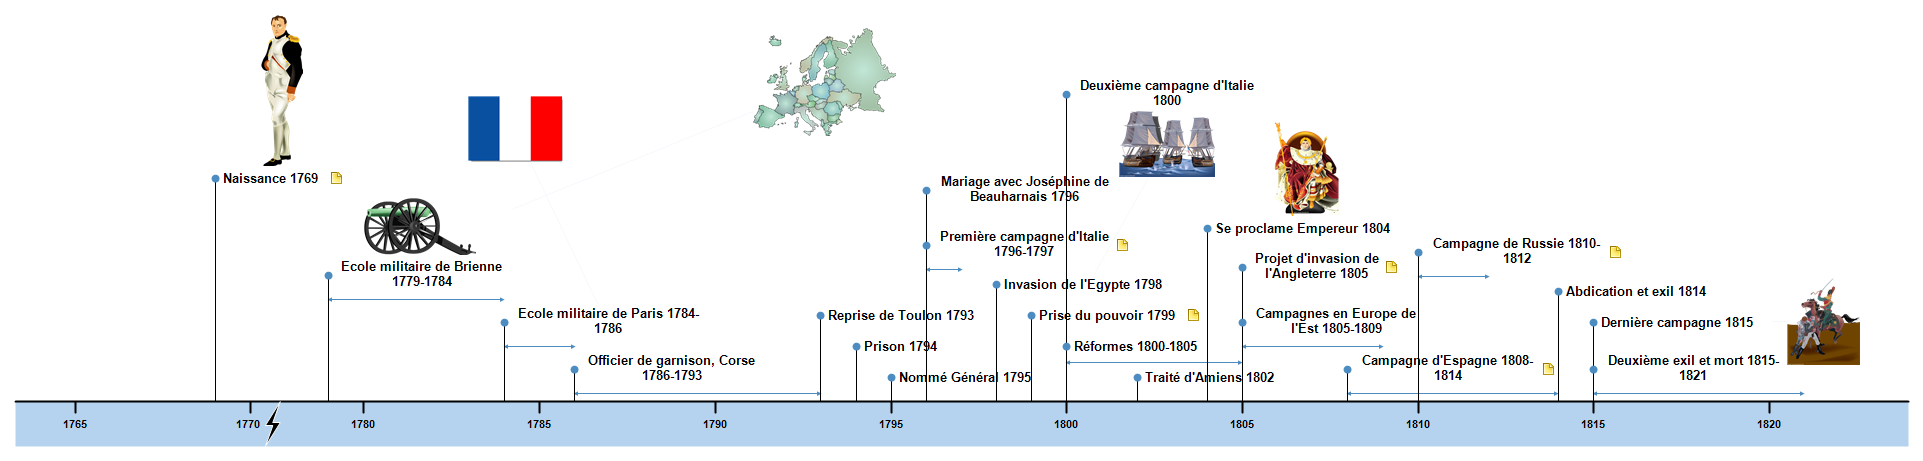 Napoléon Ier Timeline